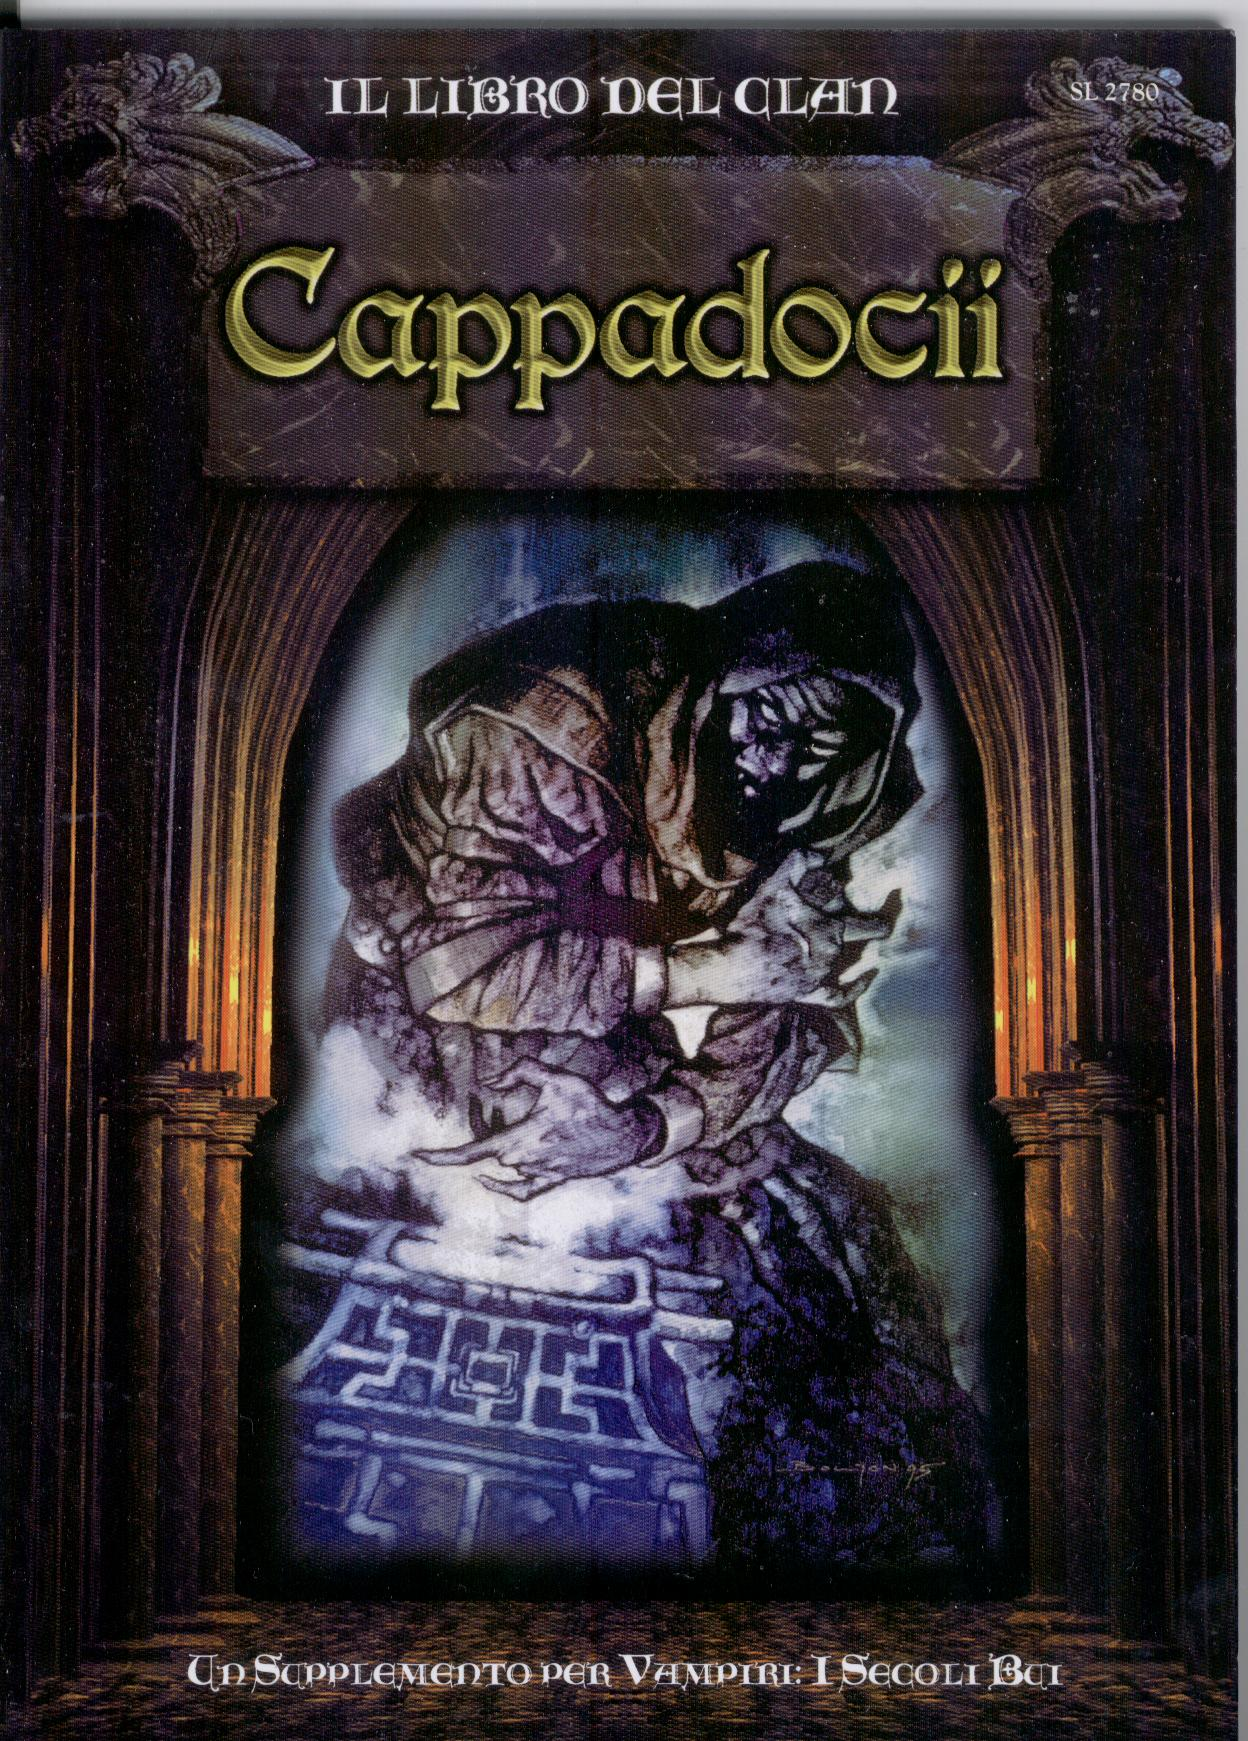 Cappadocii